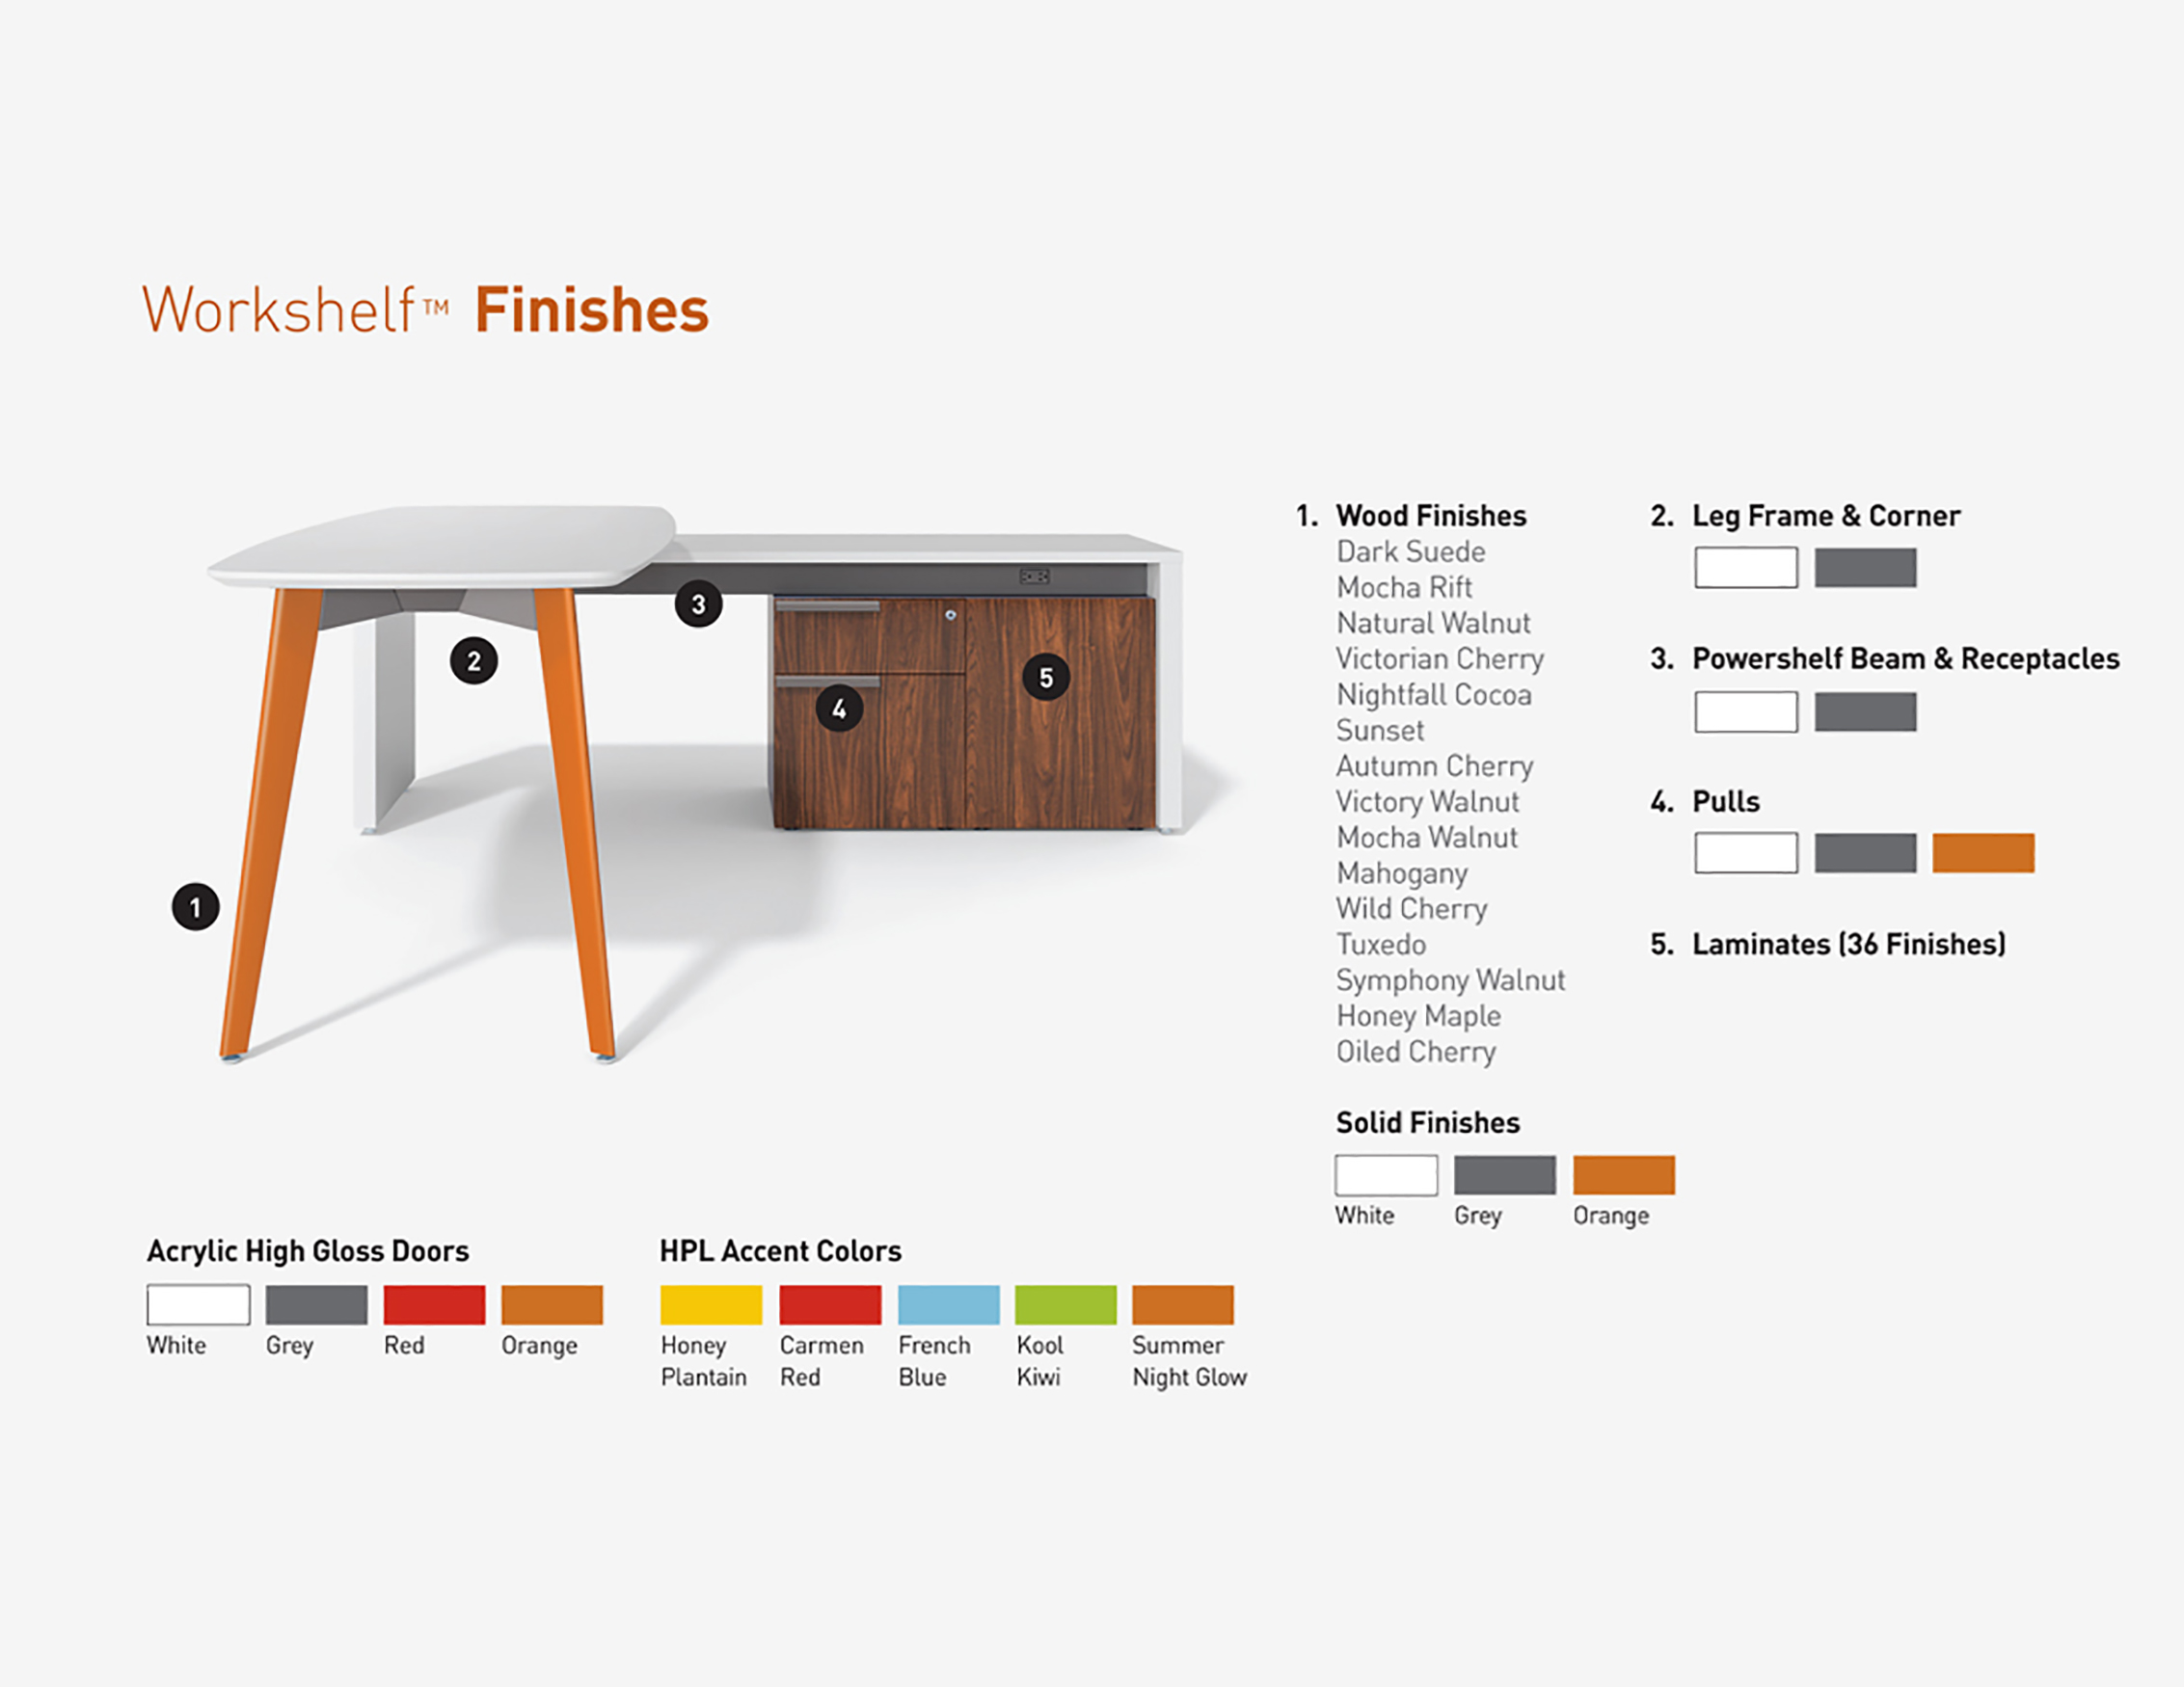 Finishes-Workshelf.jpg